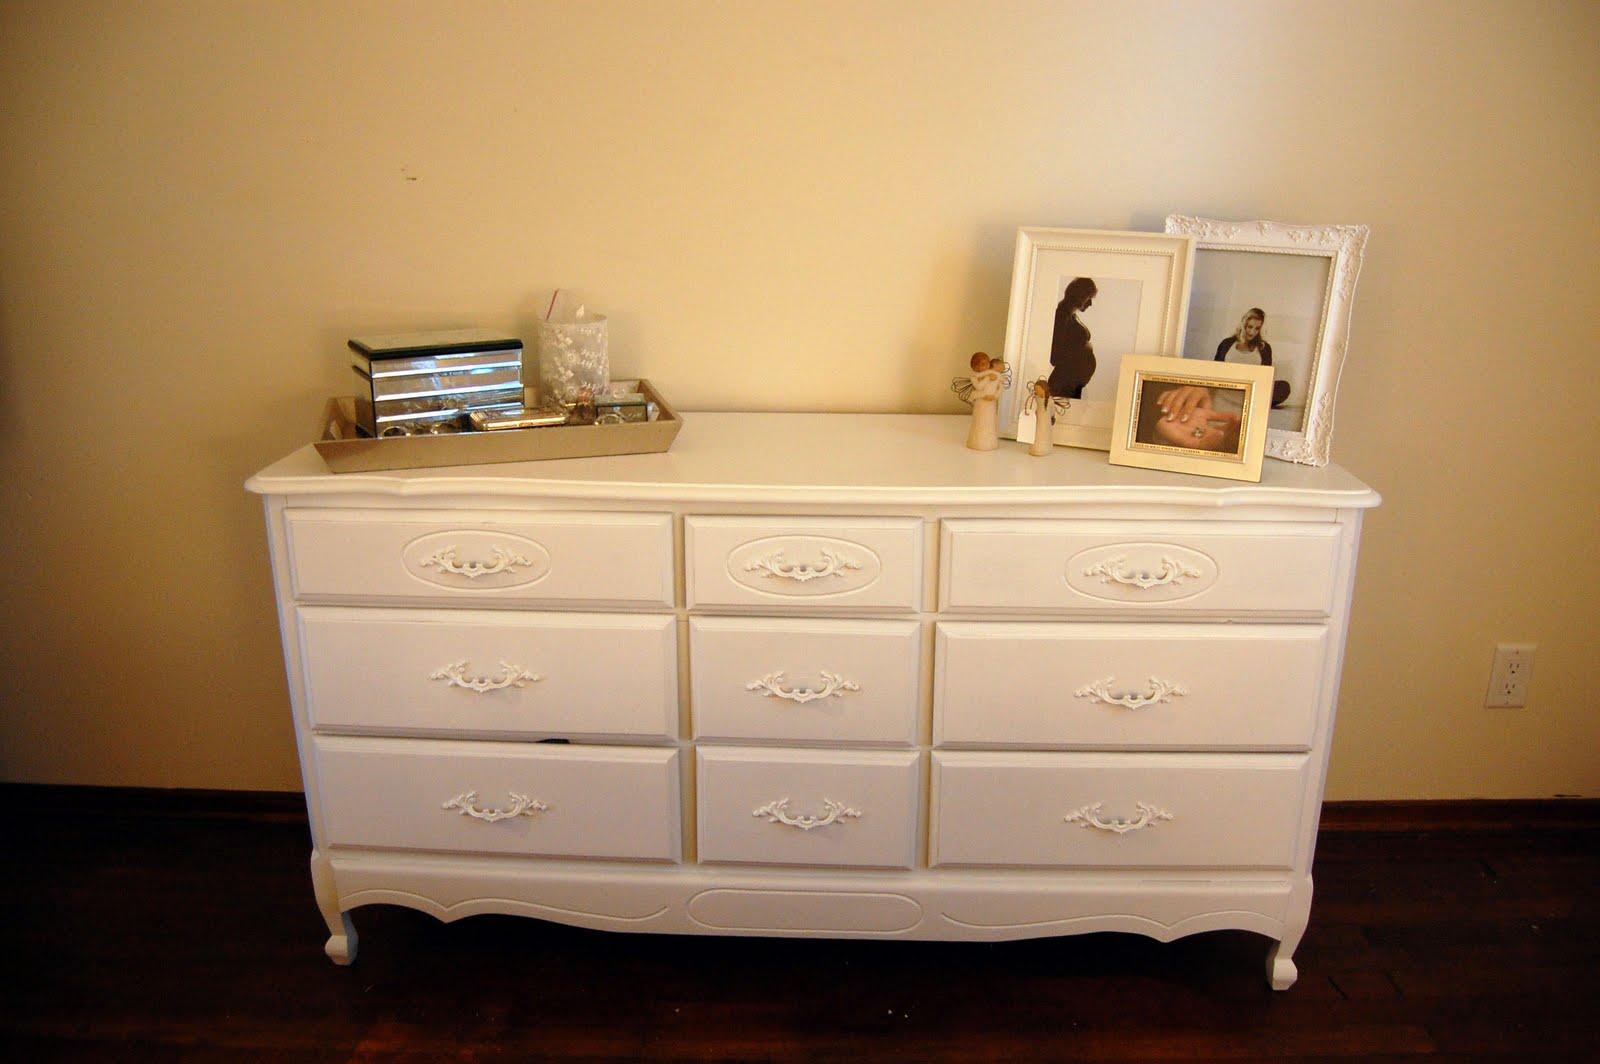 dresser decorating ideas - Design Decoration